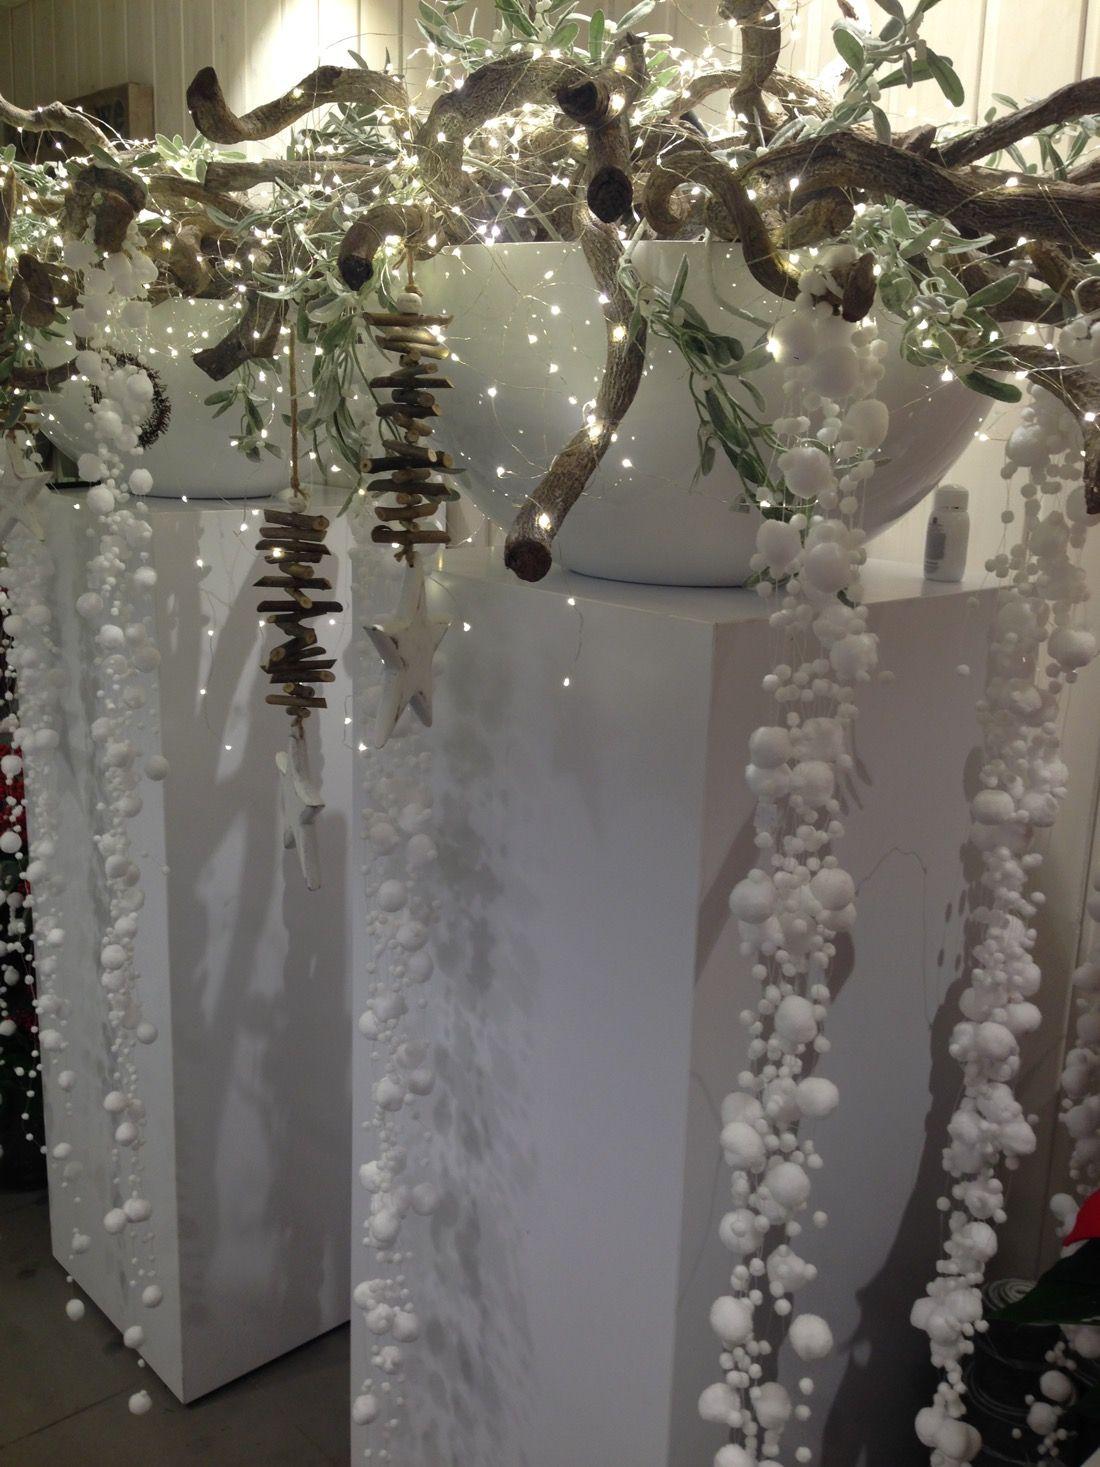 Kwiaciarnia Emi Reda Kwiaciarnia Reda Florystyka Slubna Trojmiasto Table Decorations Holiday Decor Decor